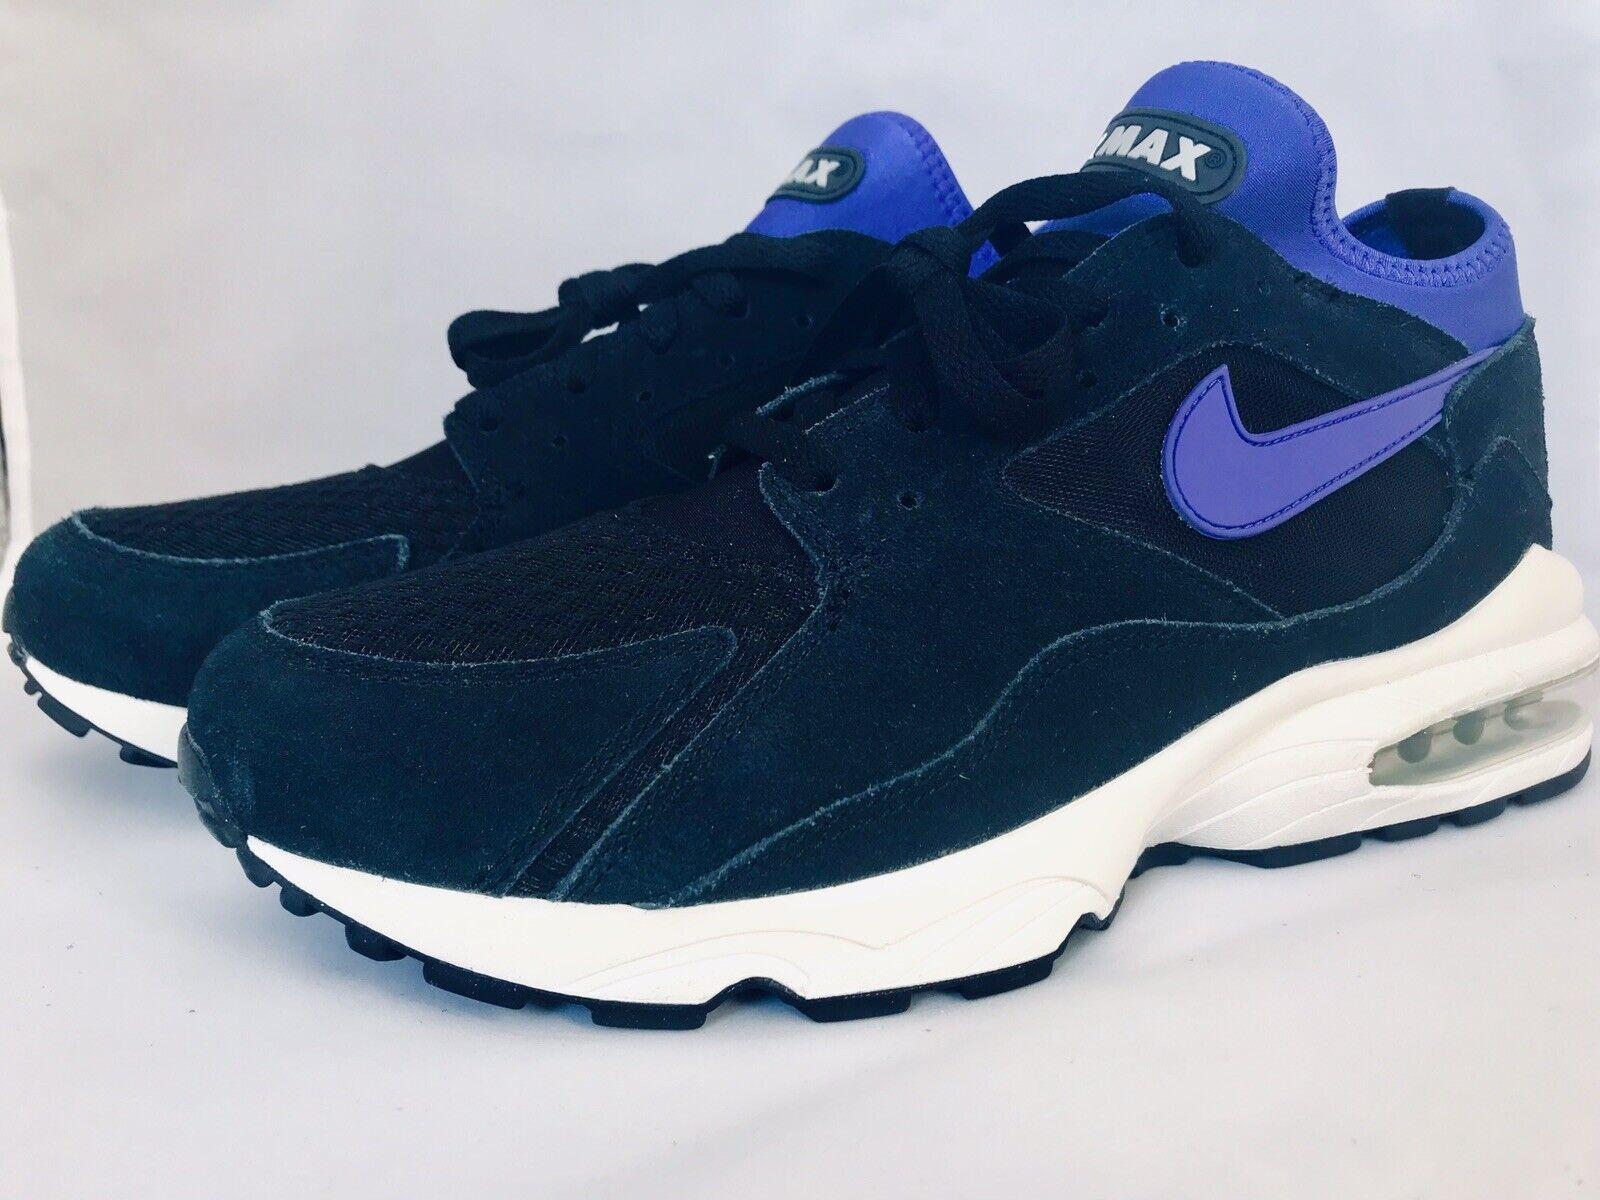 Nike Air Max 93 Men's shoes Size 11 Black Persian purple Purple 306551-015 NEW